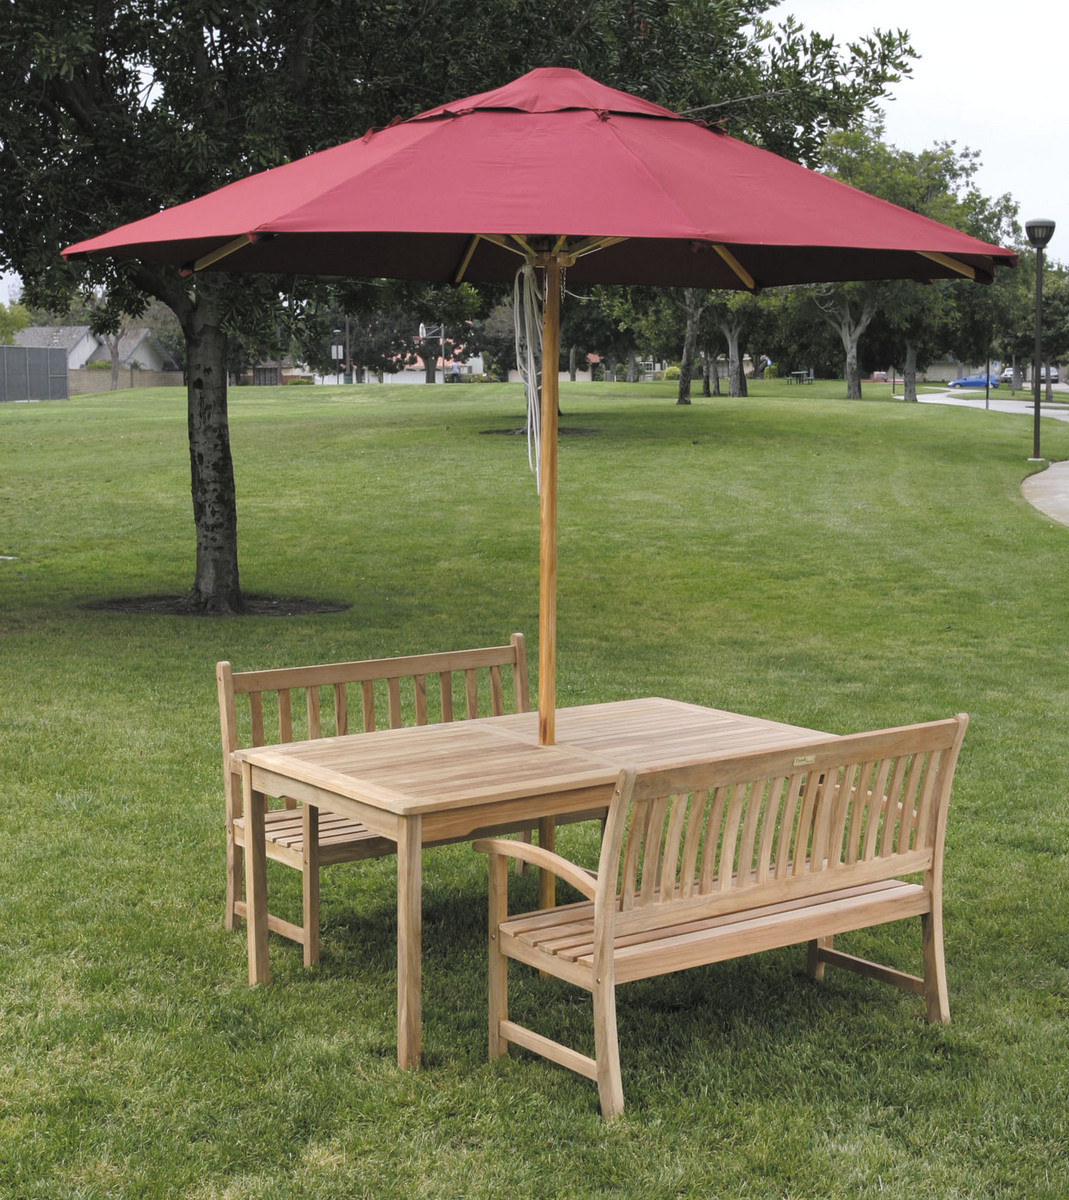 Wholesale Umbrellas in Bulk at Discount - Buy Cheap Rain and Golf